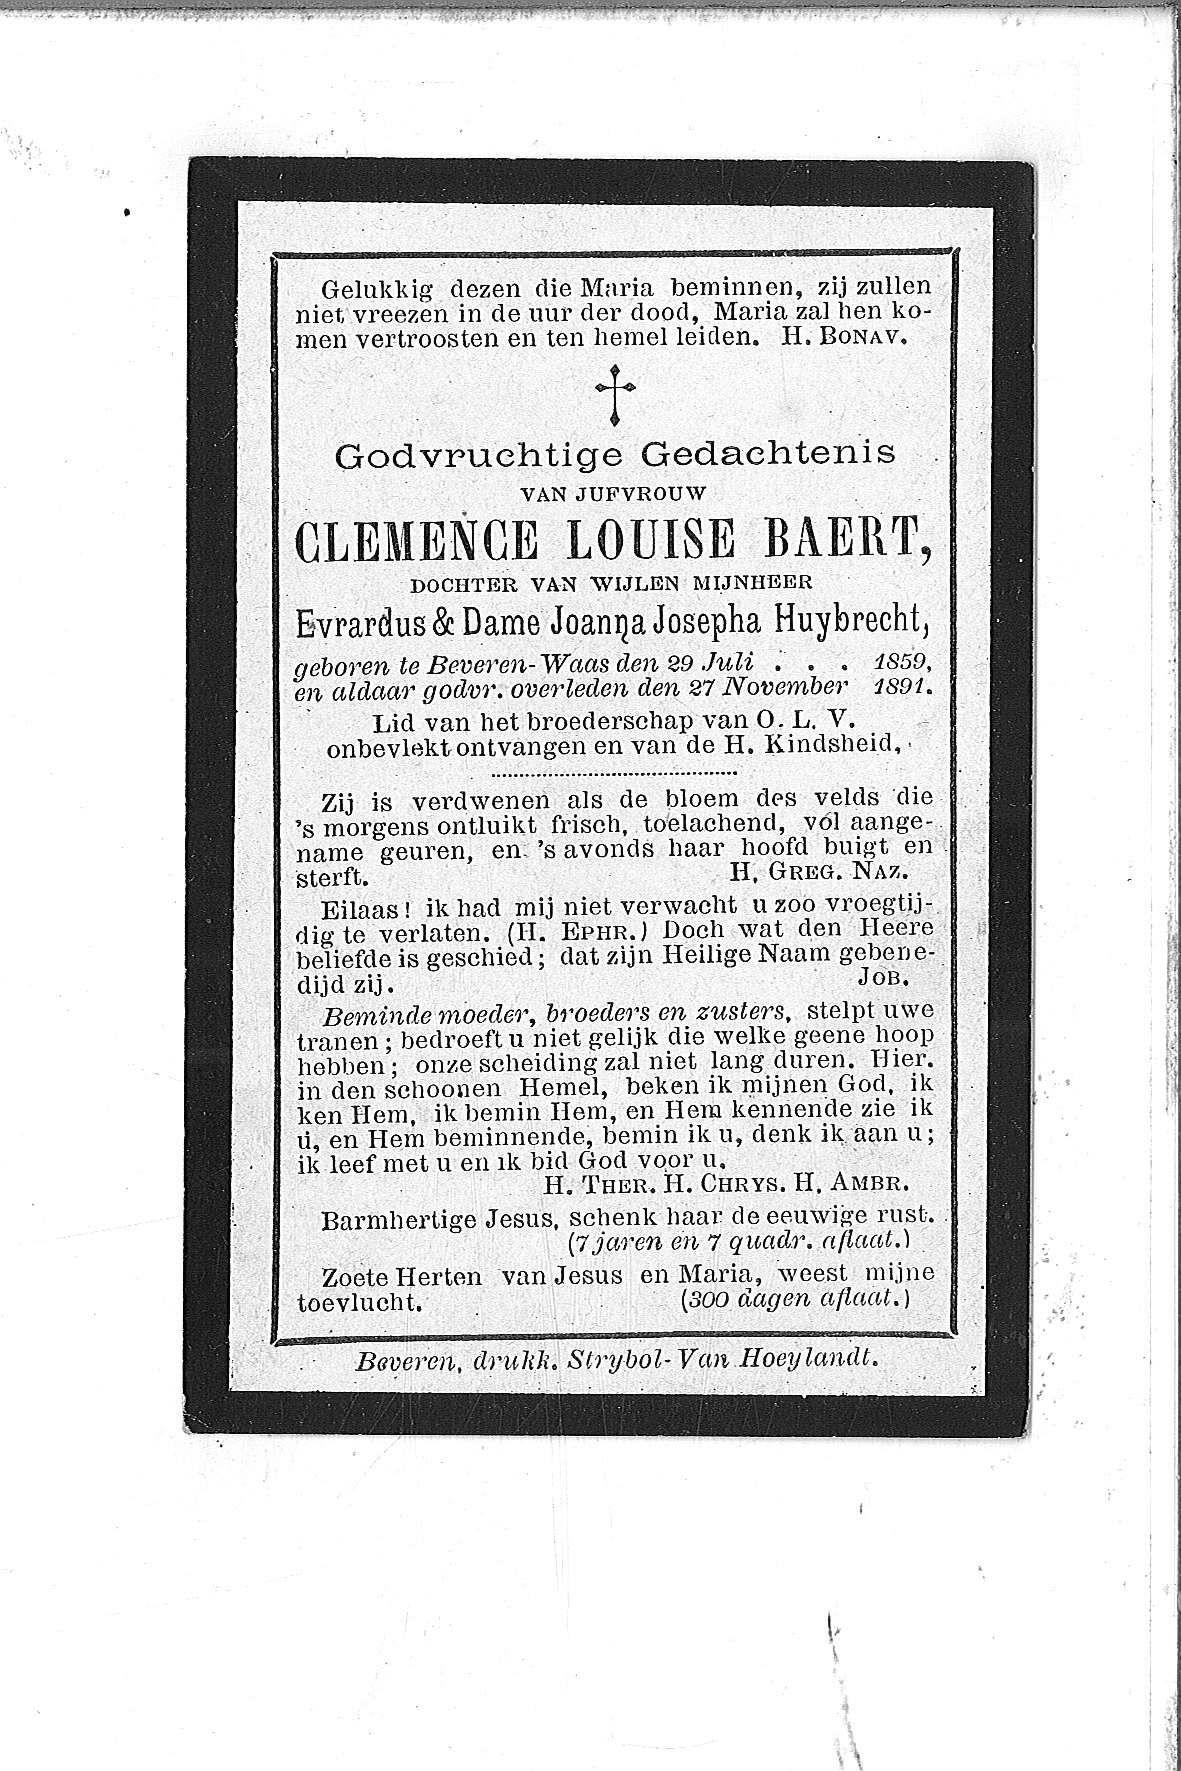 Clemence-Louise(1891)20140701100228_00016.jpg